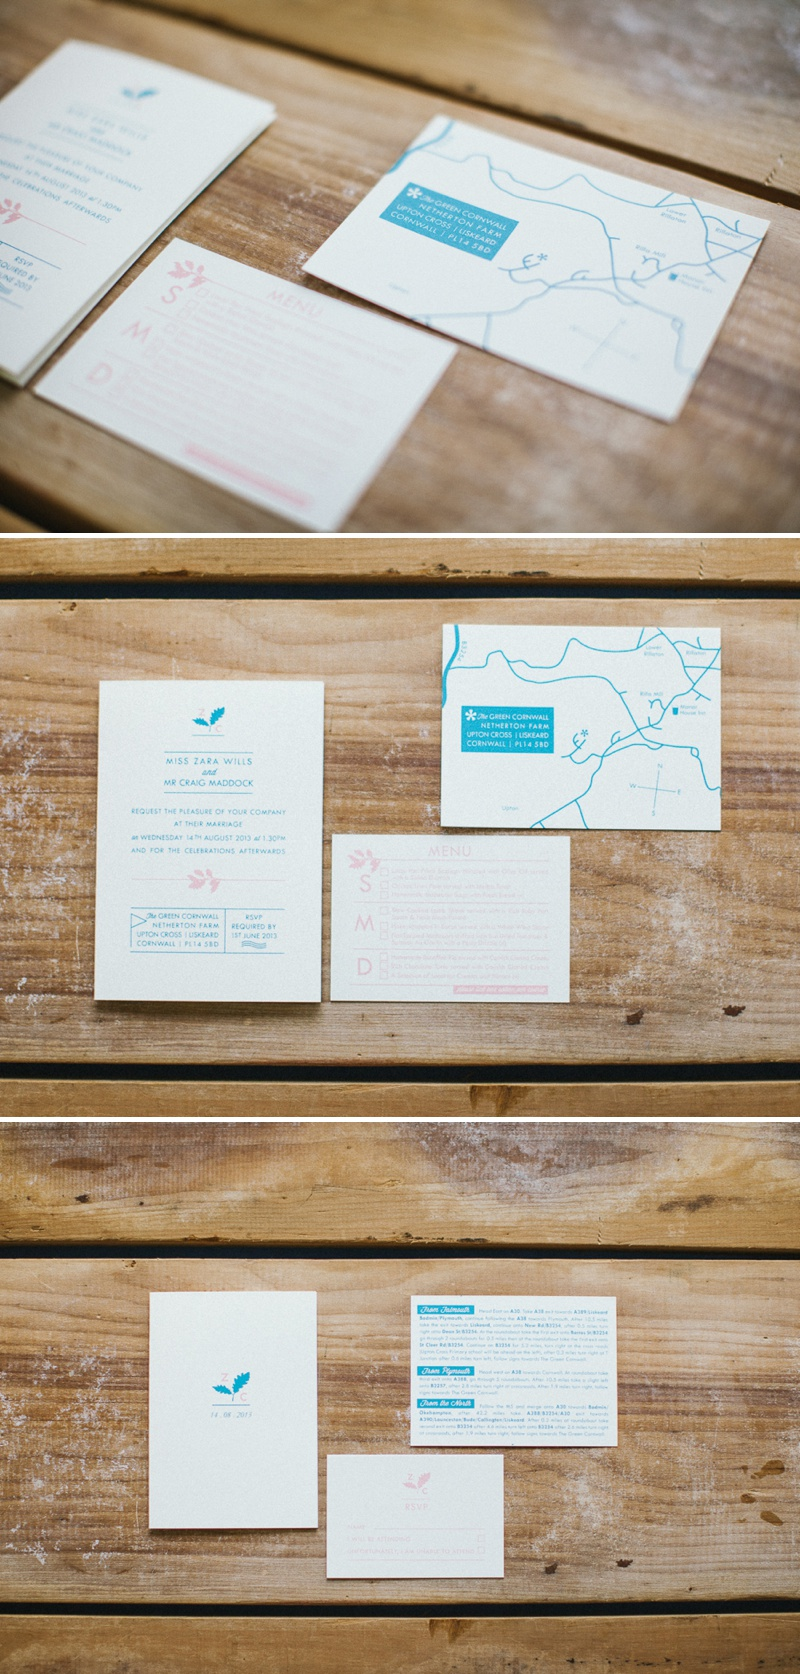 Pirrip Press Blue Letterpressed Wedding Stationery Invitations Oak Tree Motif